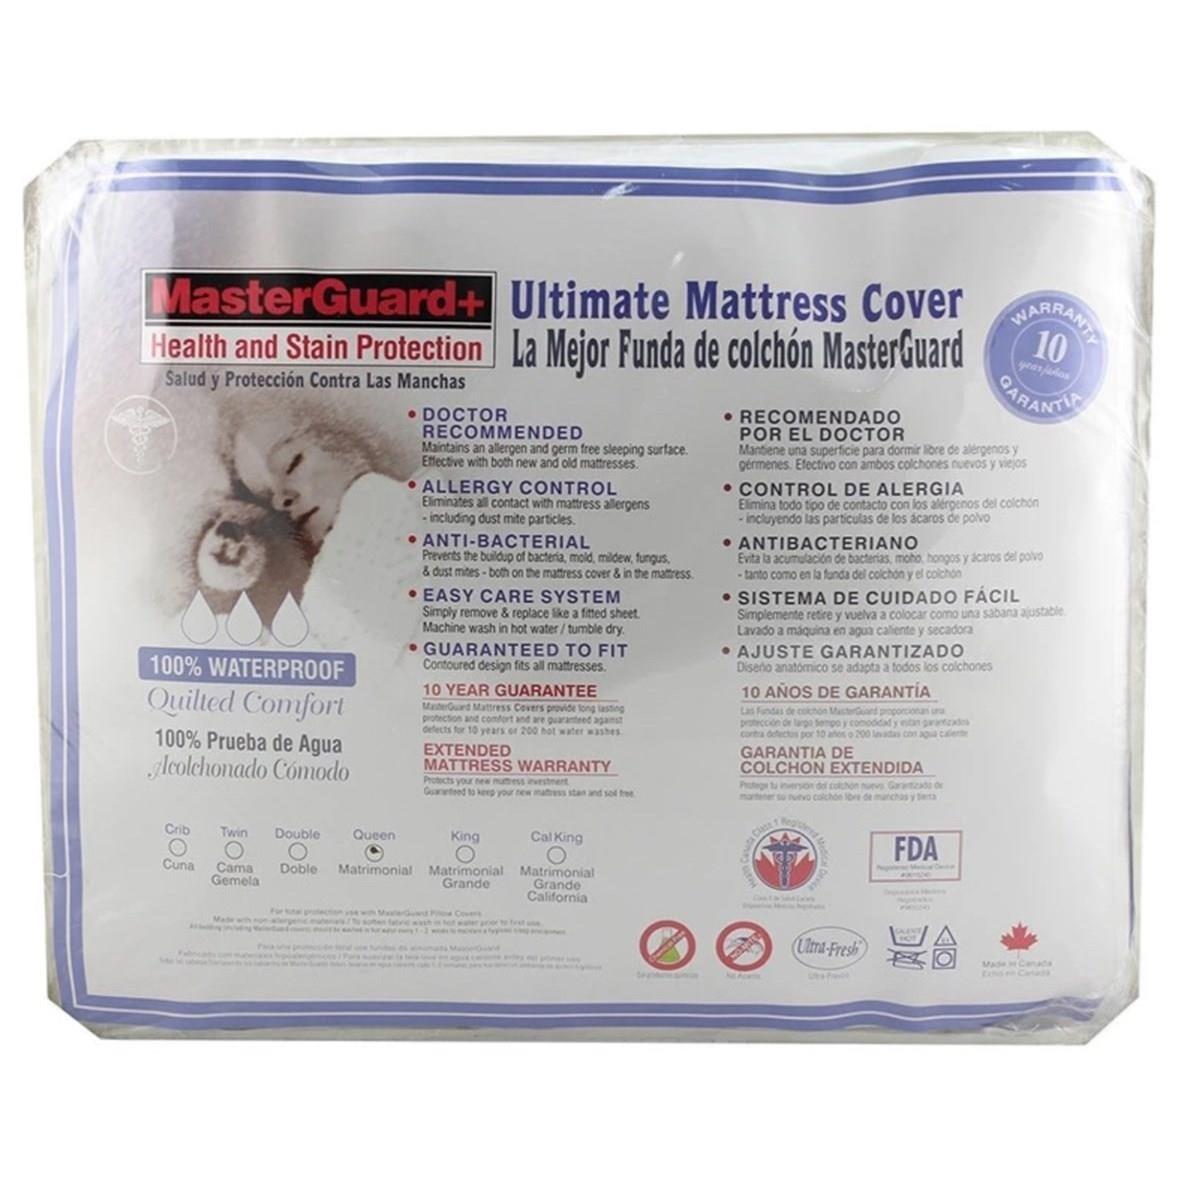 Luxury Protector Full Luxury Mattress Protector by UV3 Masterguard at Sam Levitz Furniture